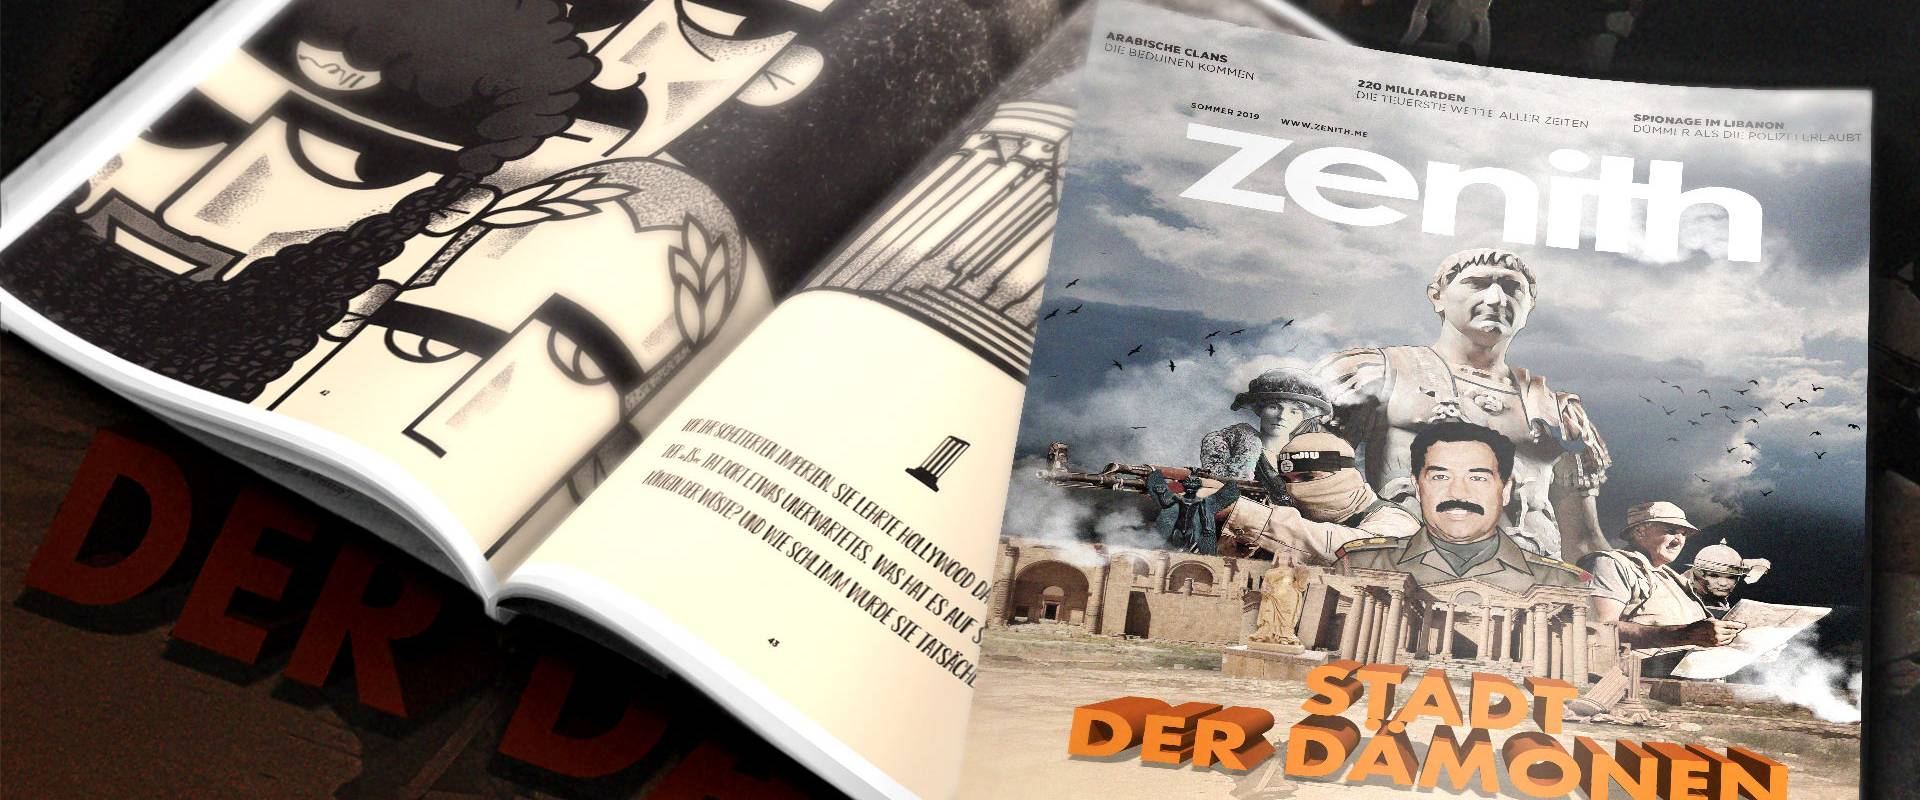 zenith_1/19_cover